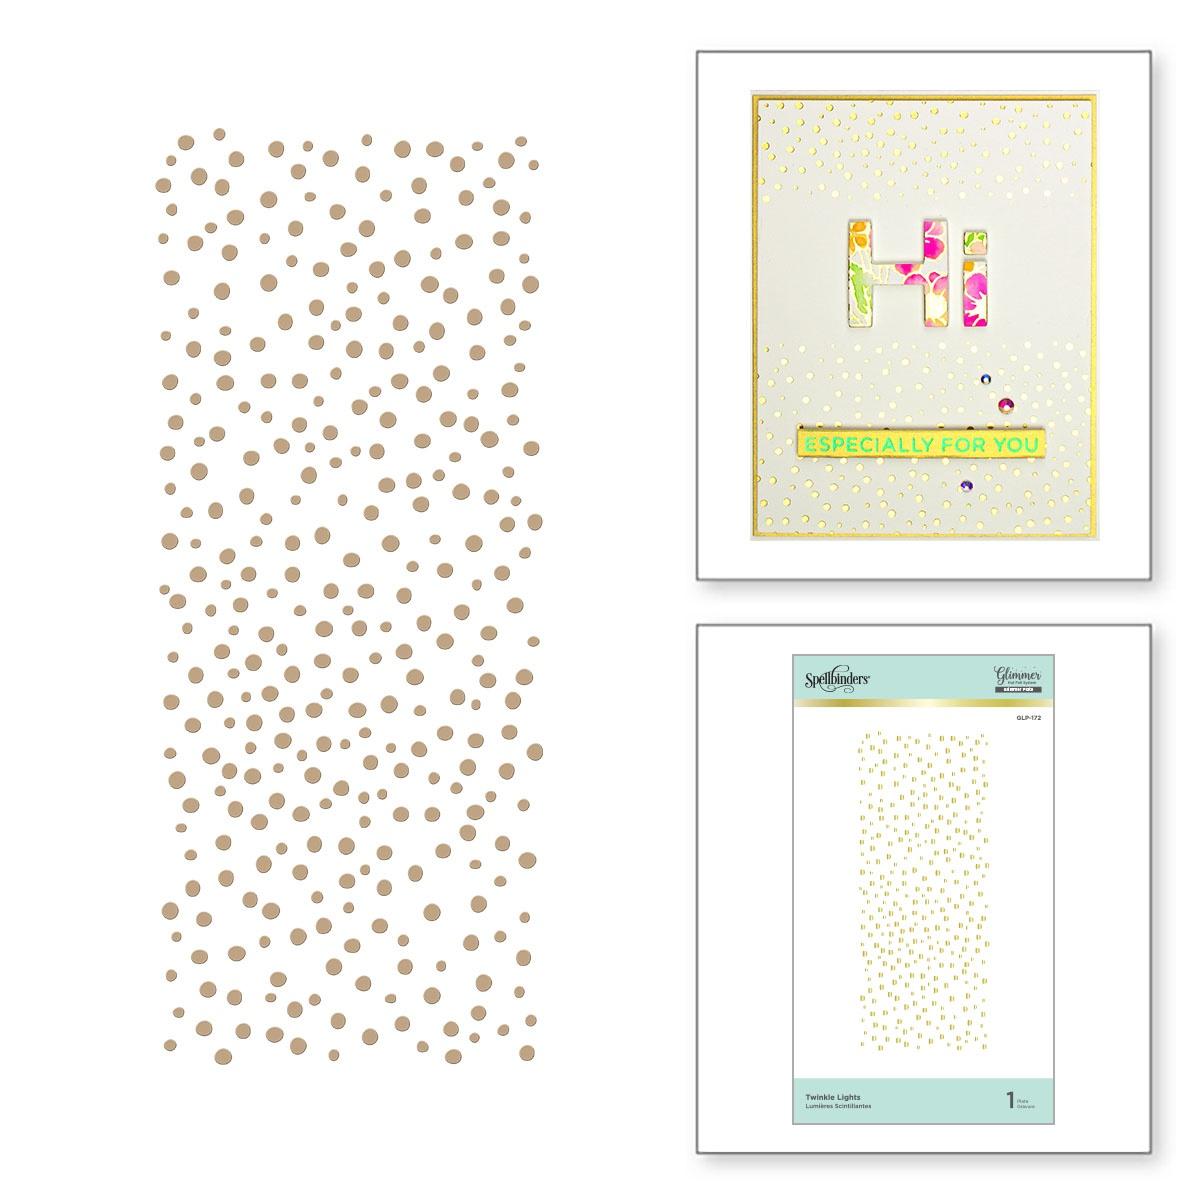 Spellbinders - Glimmer Backgrounds Hot Foil Plate-Twinkle Lights